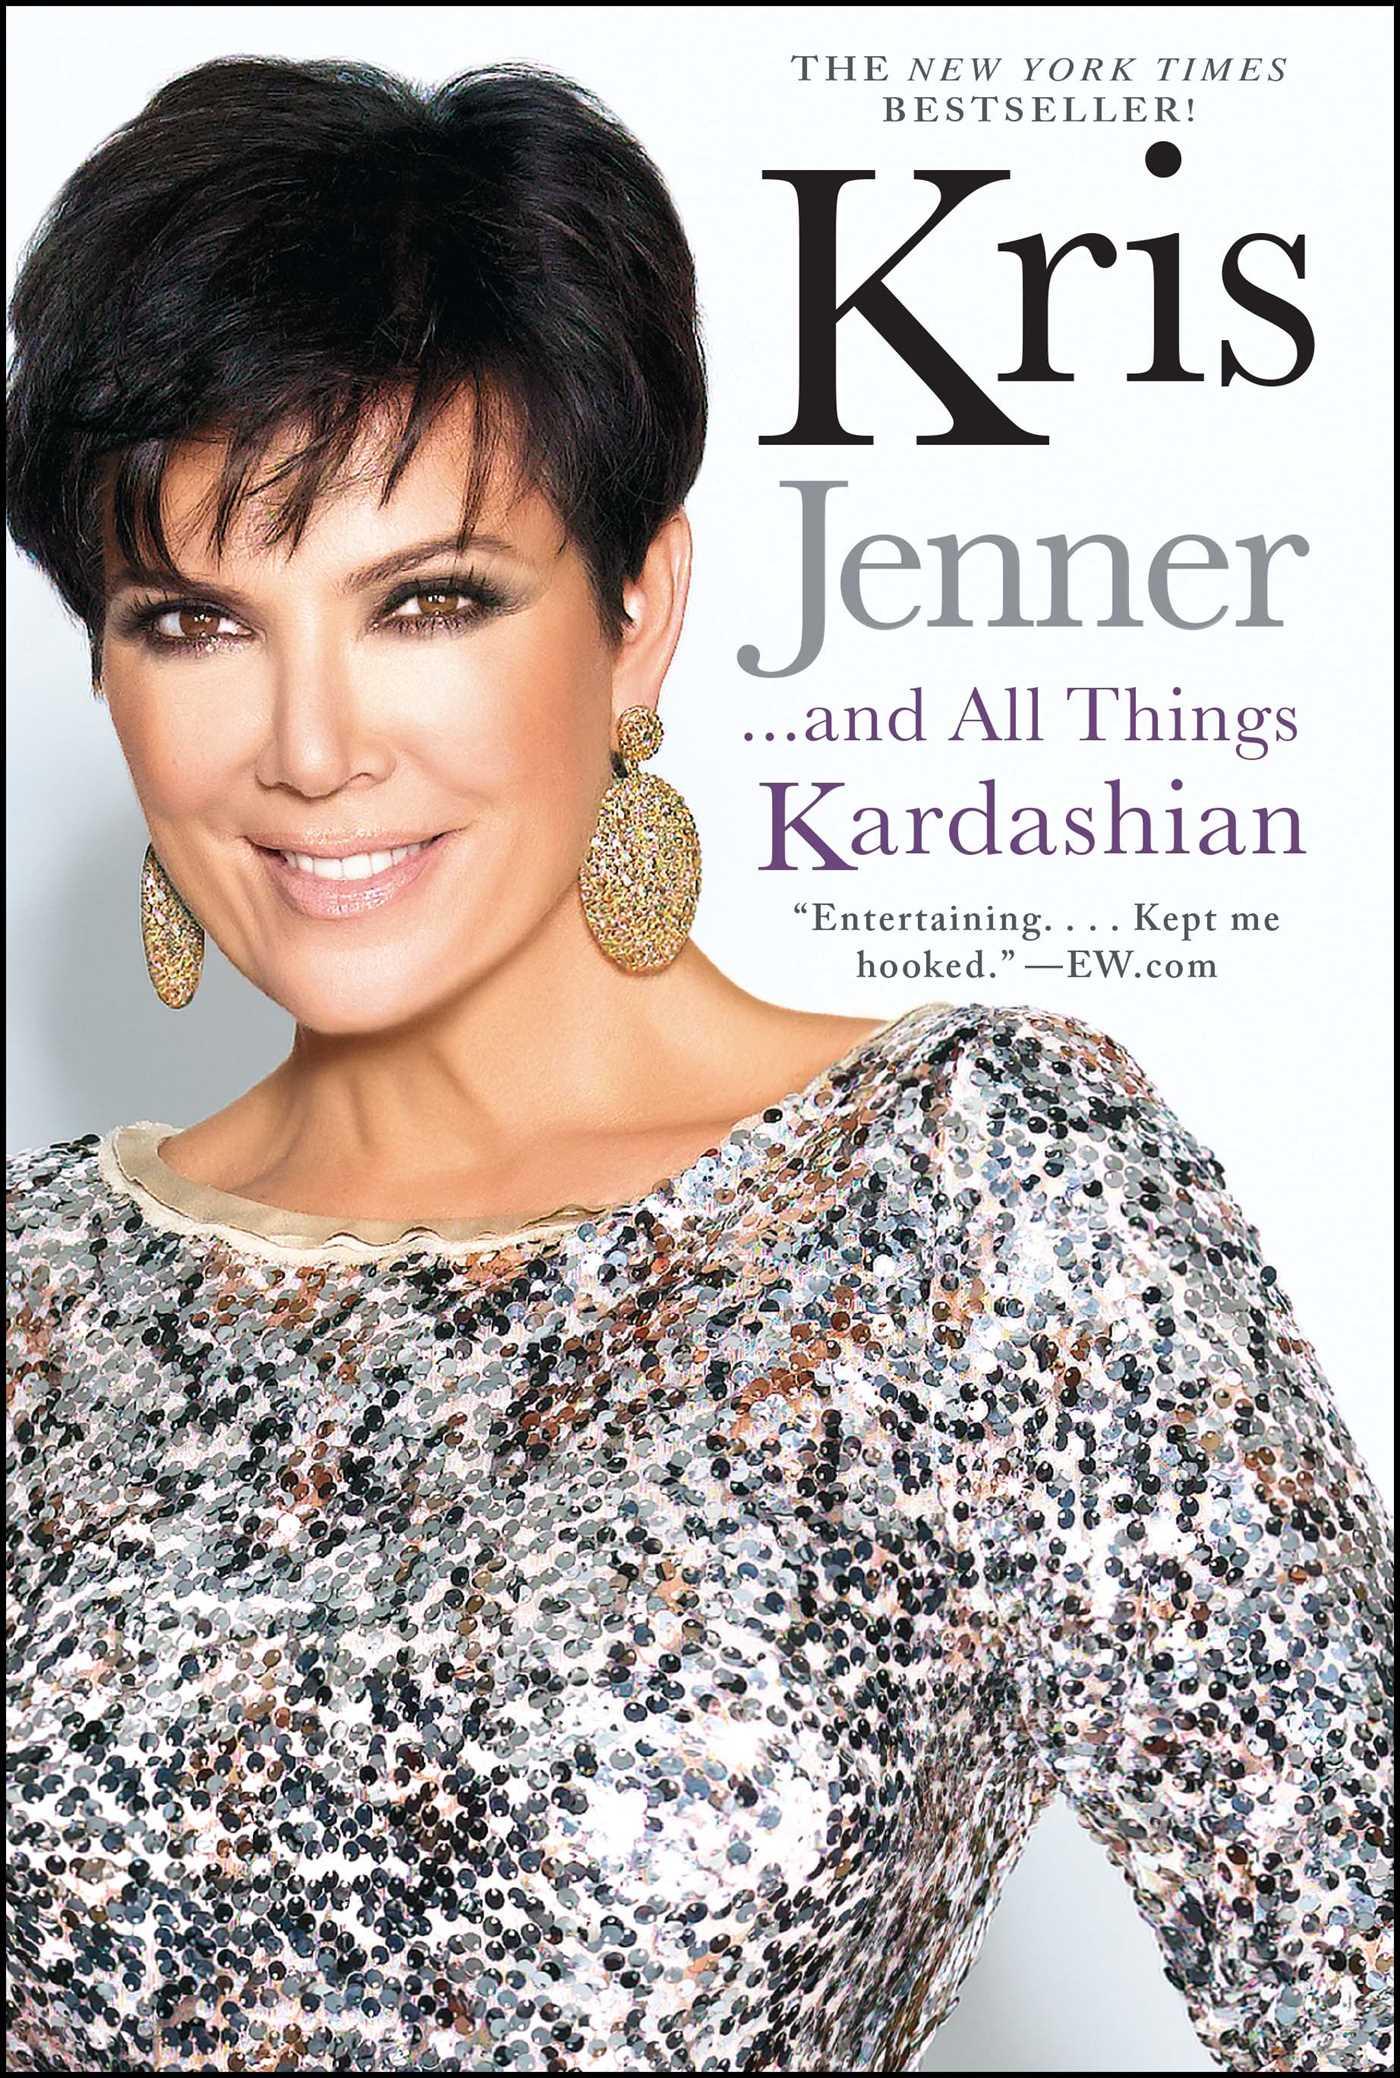 Kris jenner and all things kardashian 9781451646979 hr